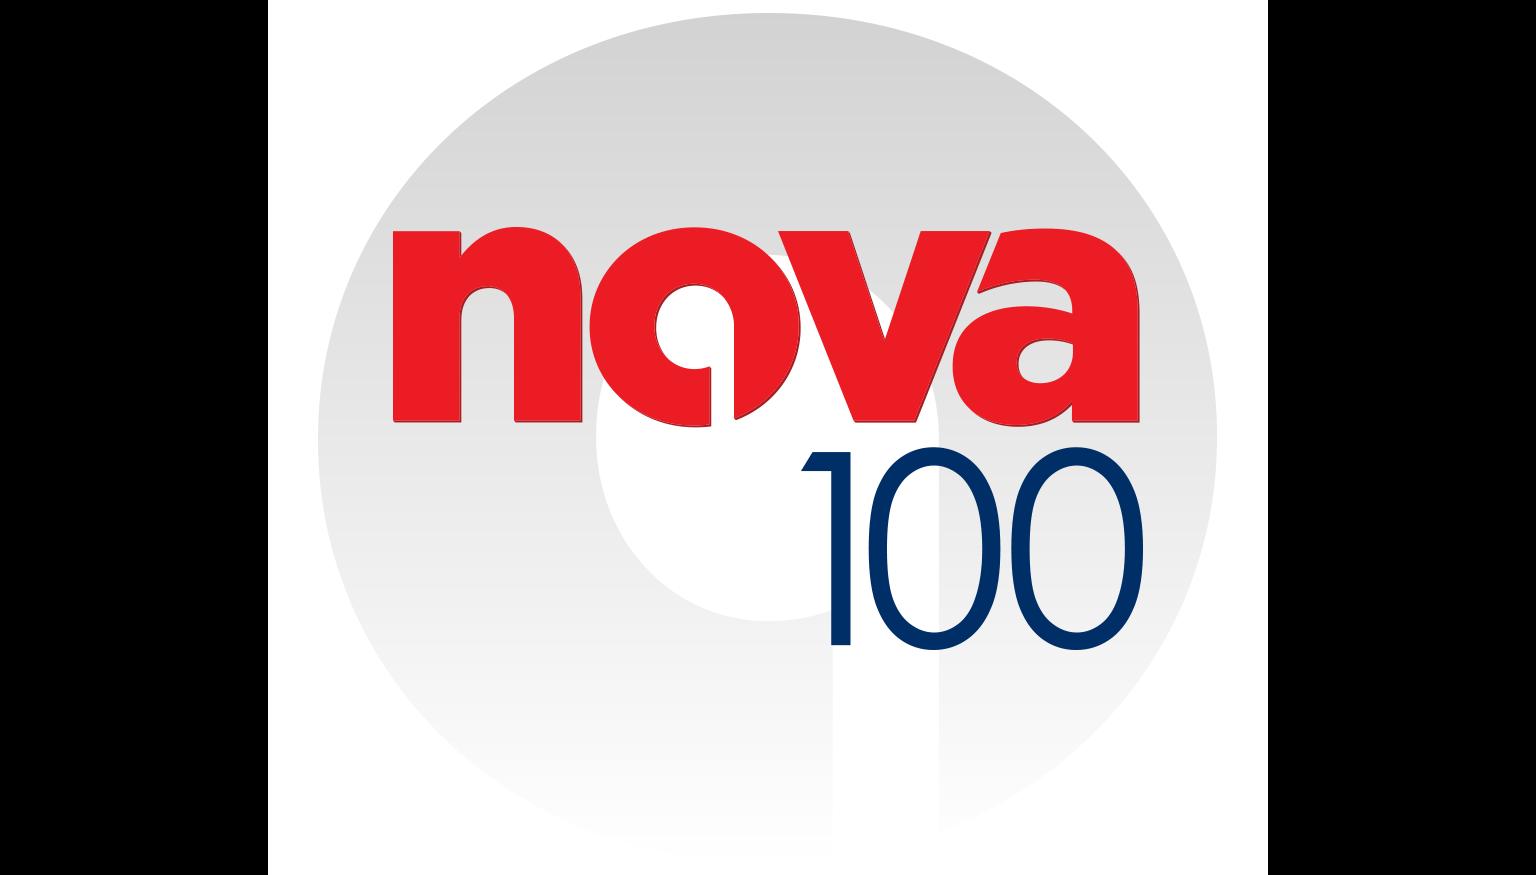 Nova100 Player | Nova 100